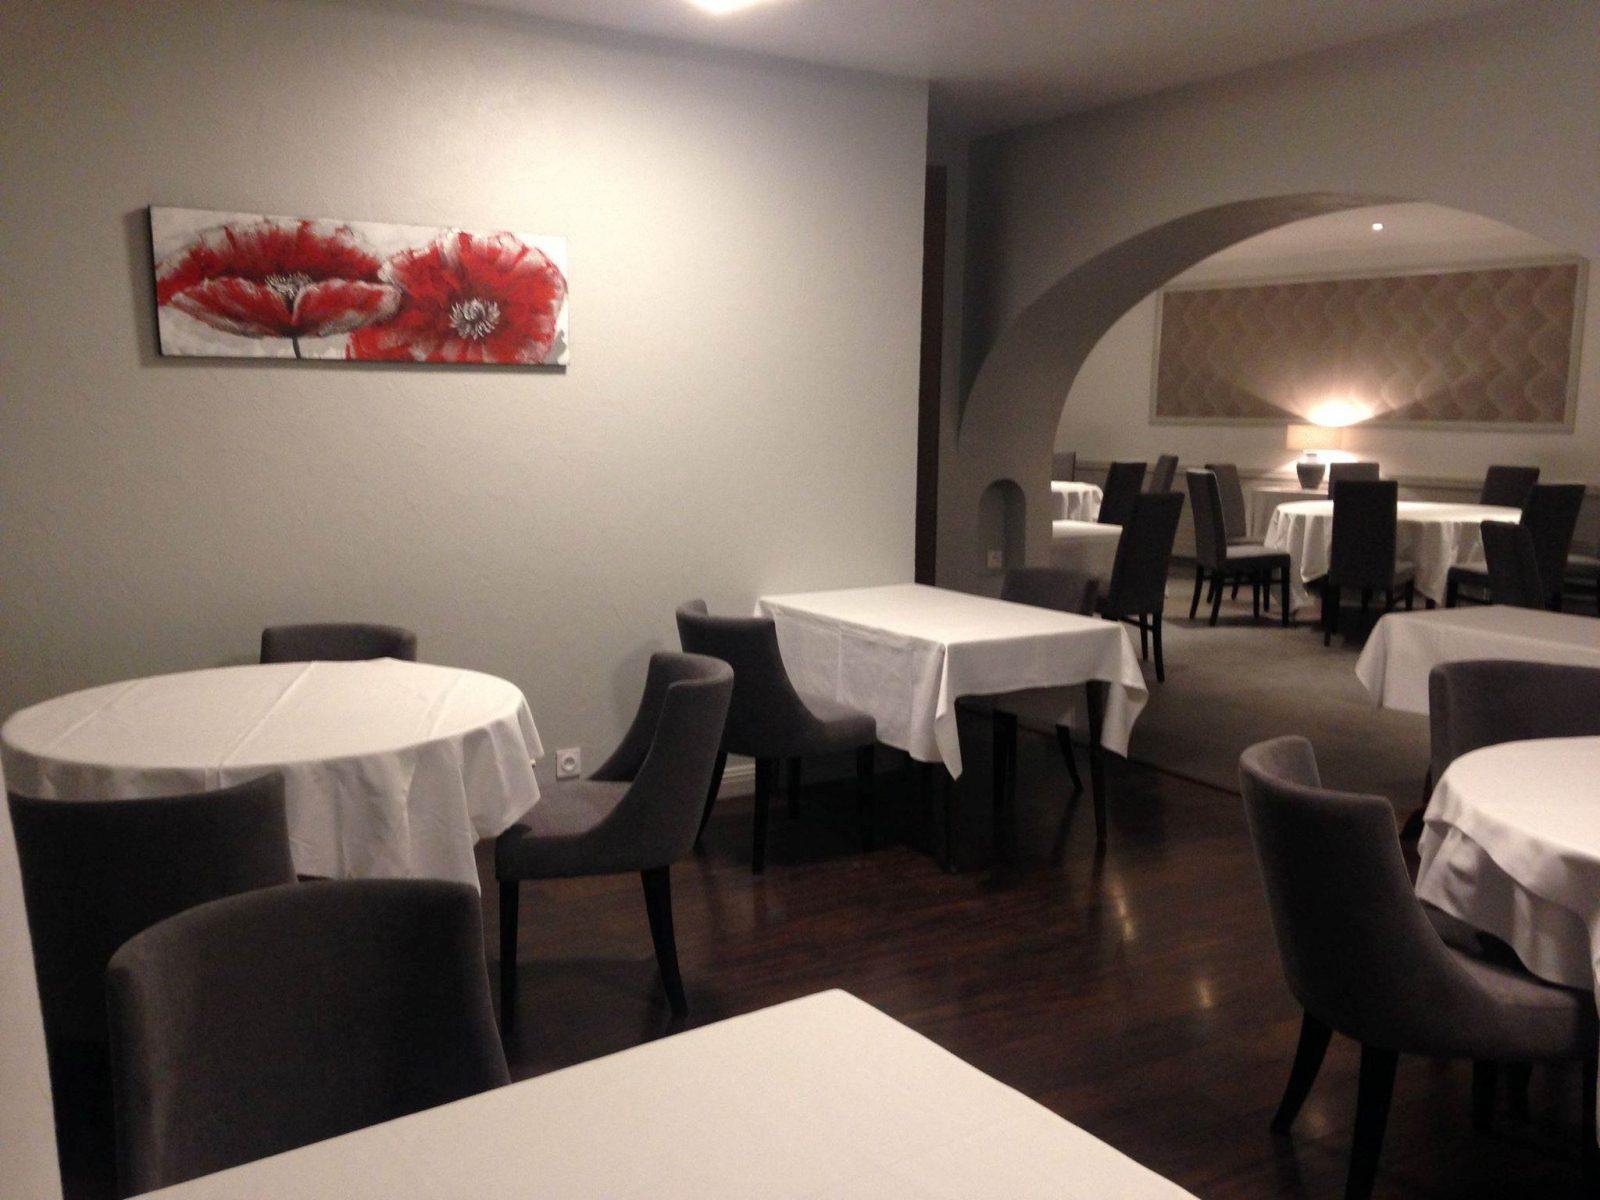 L'AUBERGE LIMERZELAISE – Restaurant à Limerzel – Morbihan – Bretagne Sud